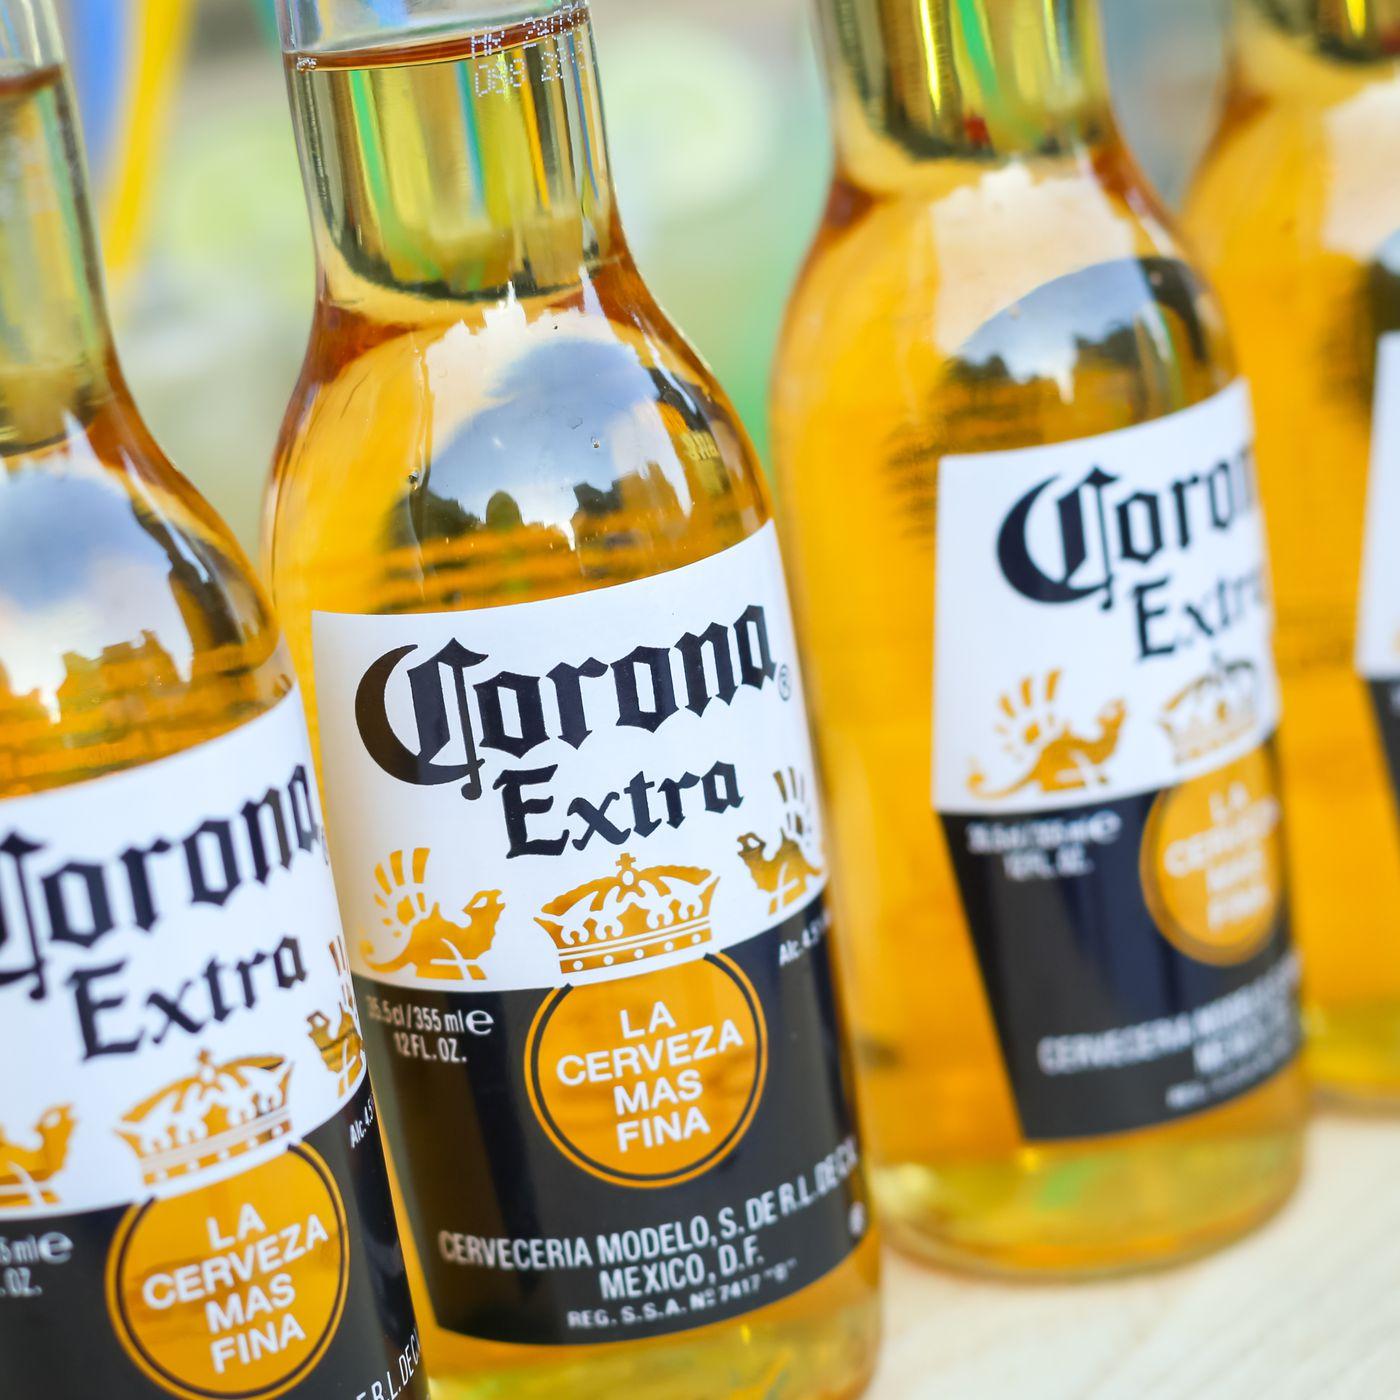 Coronavirus Panic Continues to Affect Corona Beer Marketing - Eater